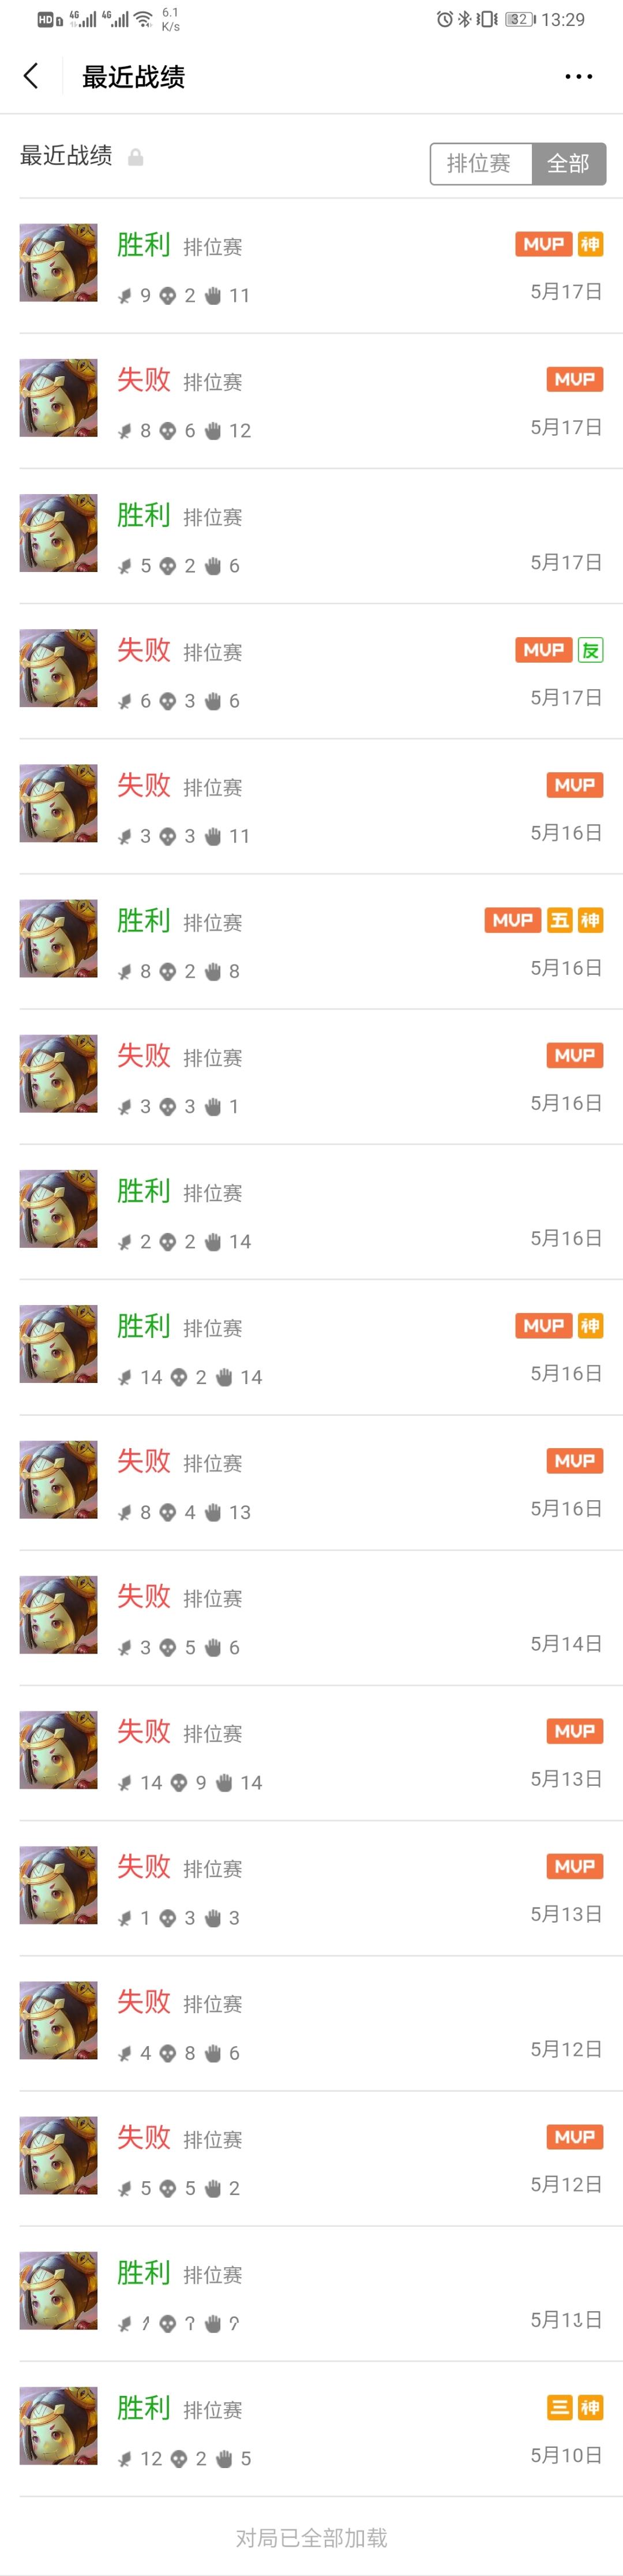 Screenshot_20200517_132929_com.tencent.mm.jpg